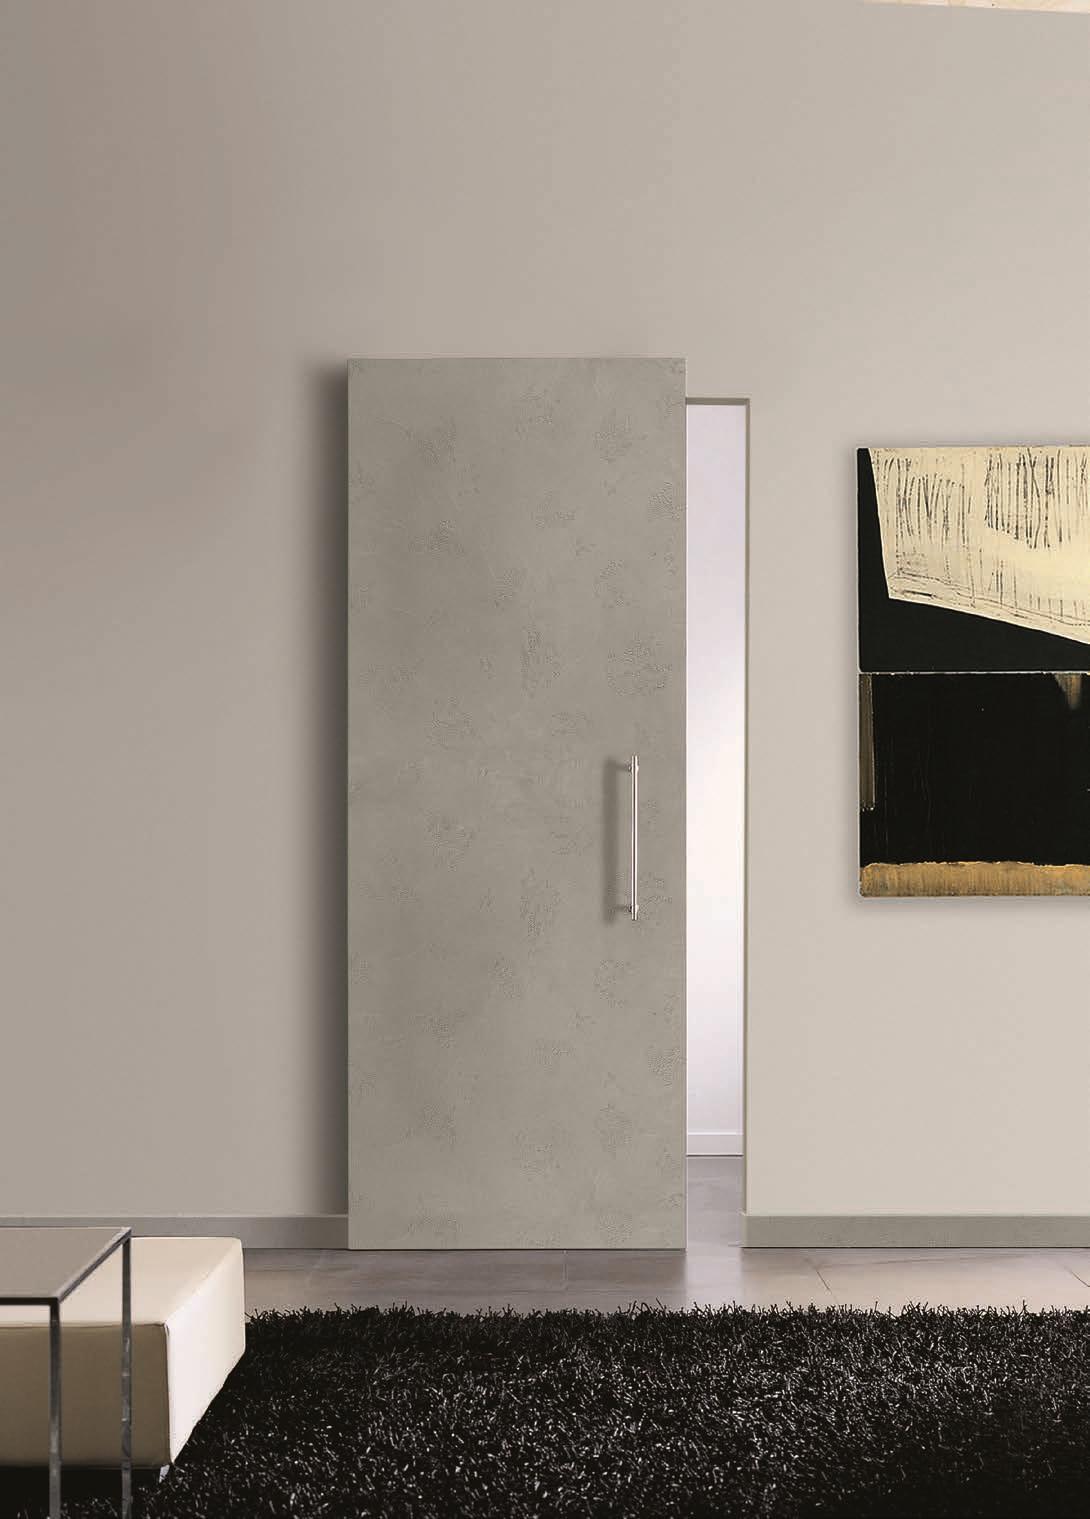 Porta scorrevole esterna bagno jy07 regardsdefemmes - Porte scorrevoli esterno muro prezzi ...